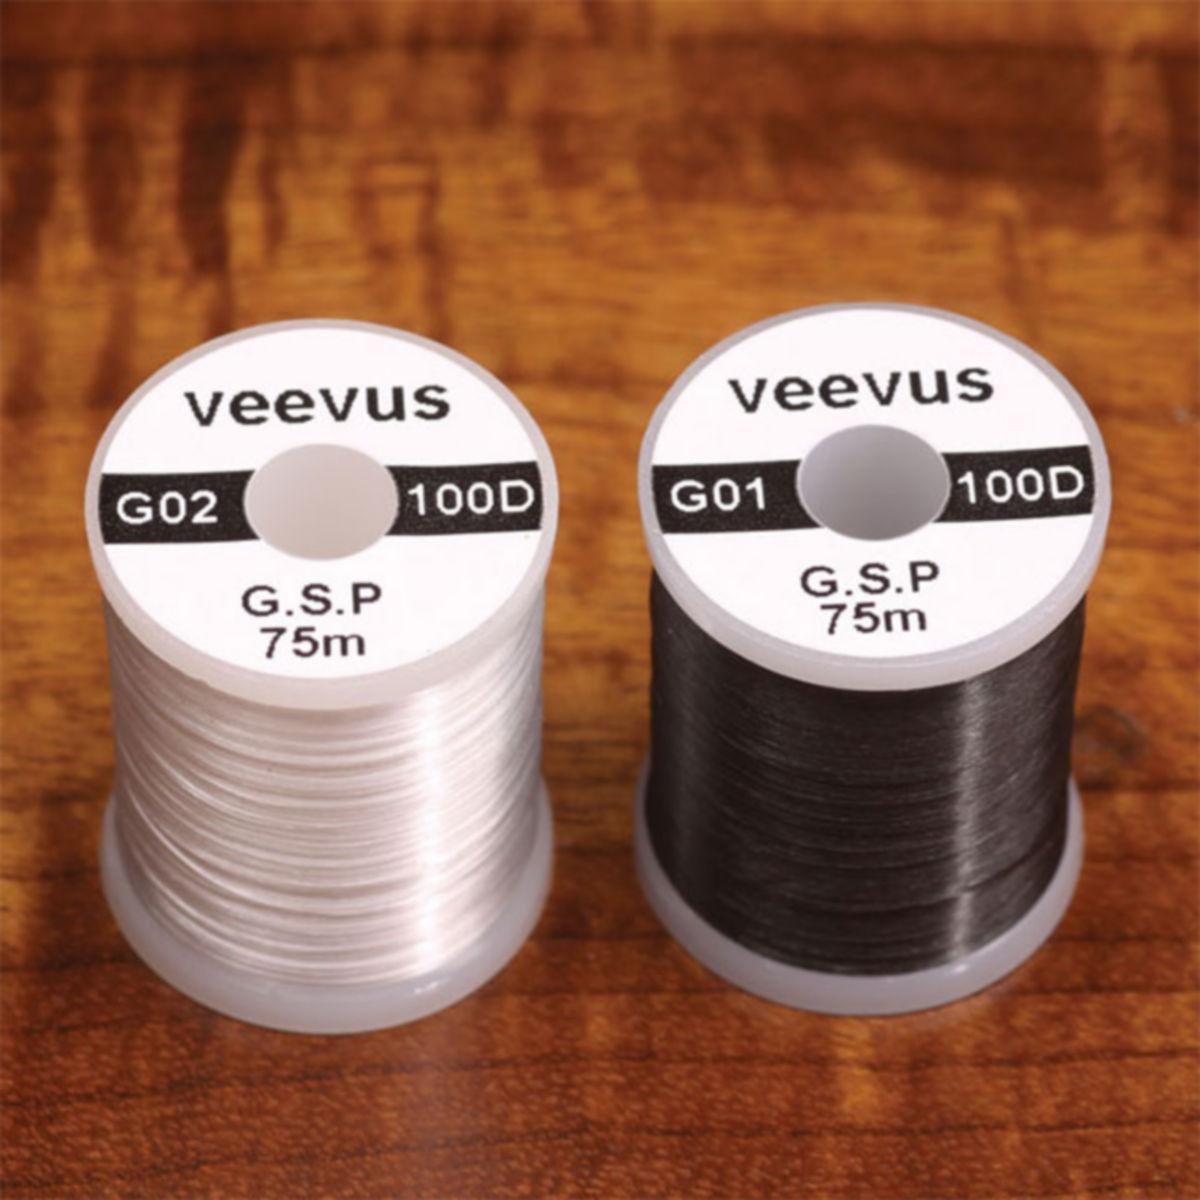 Veevus Gel Spun Thread - image number 0